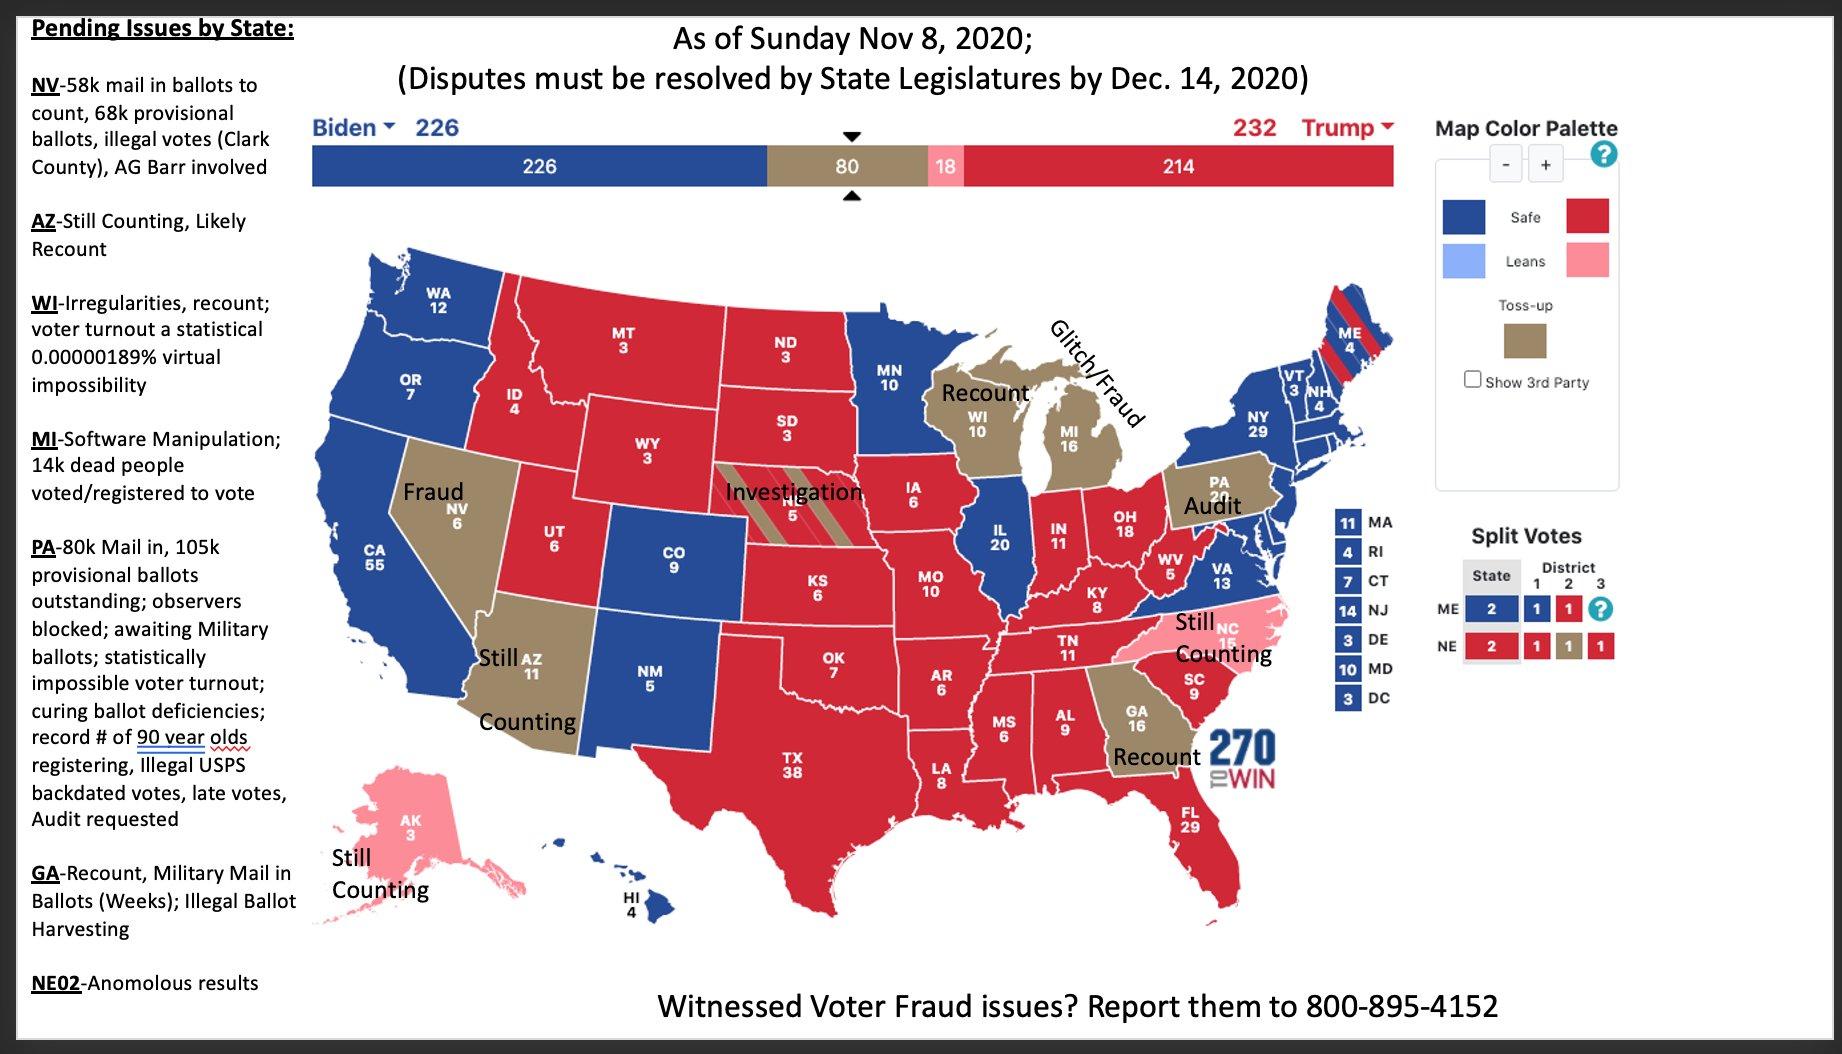 amerikaanse verkiezingen zondag 8 november